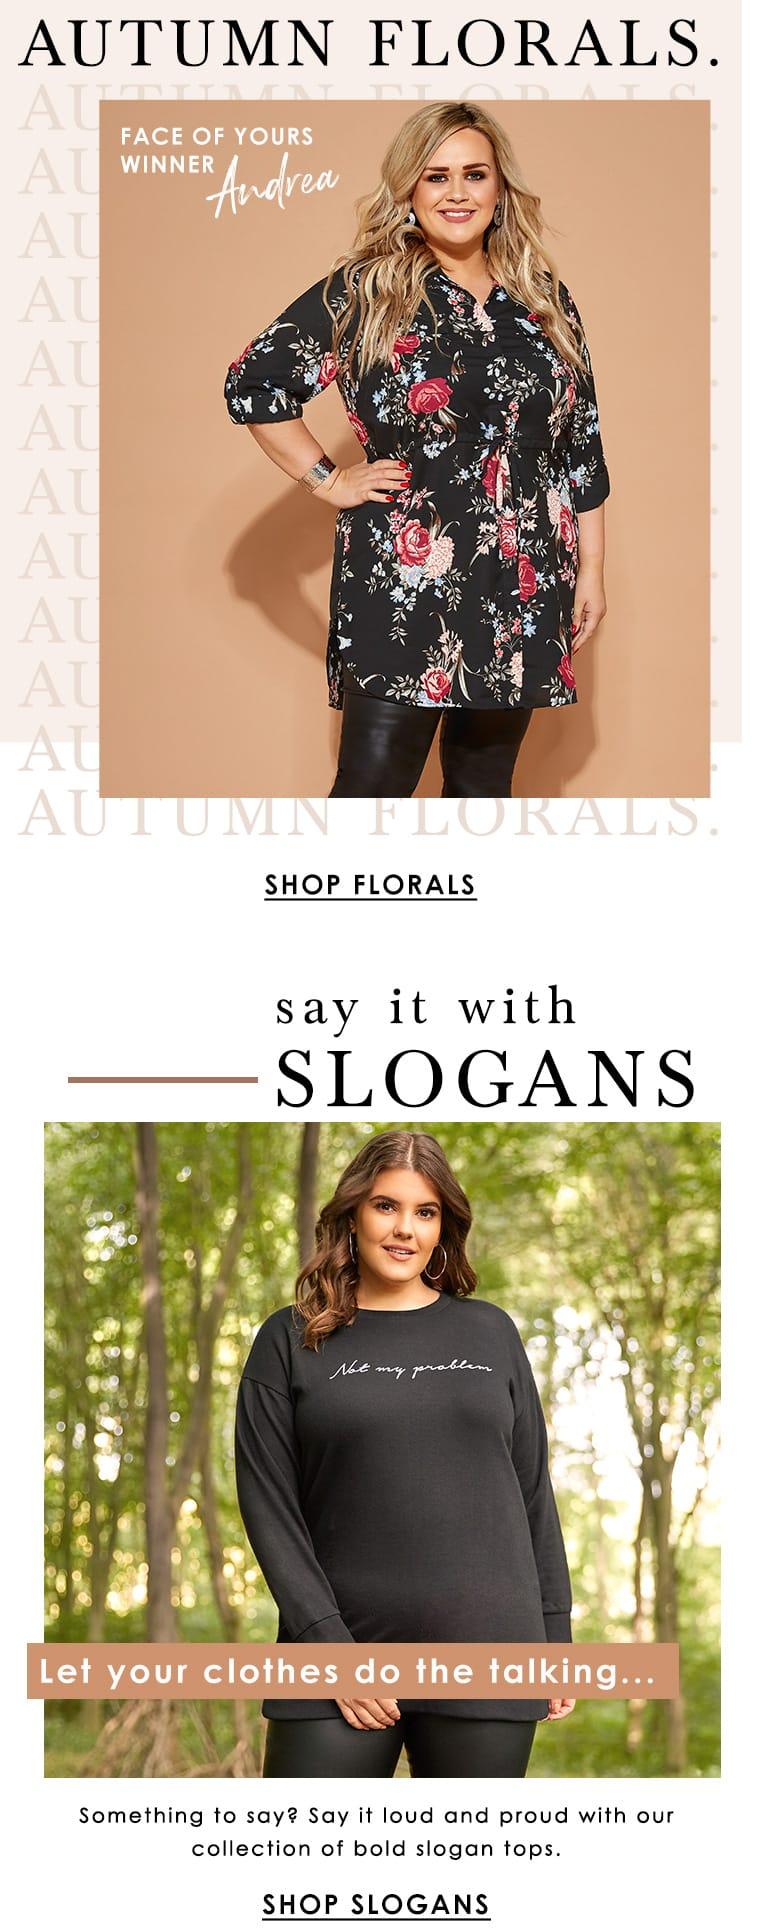 Autumn Florals - SLogans